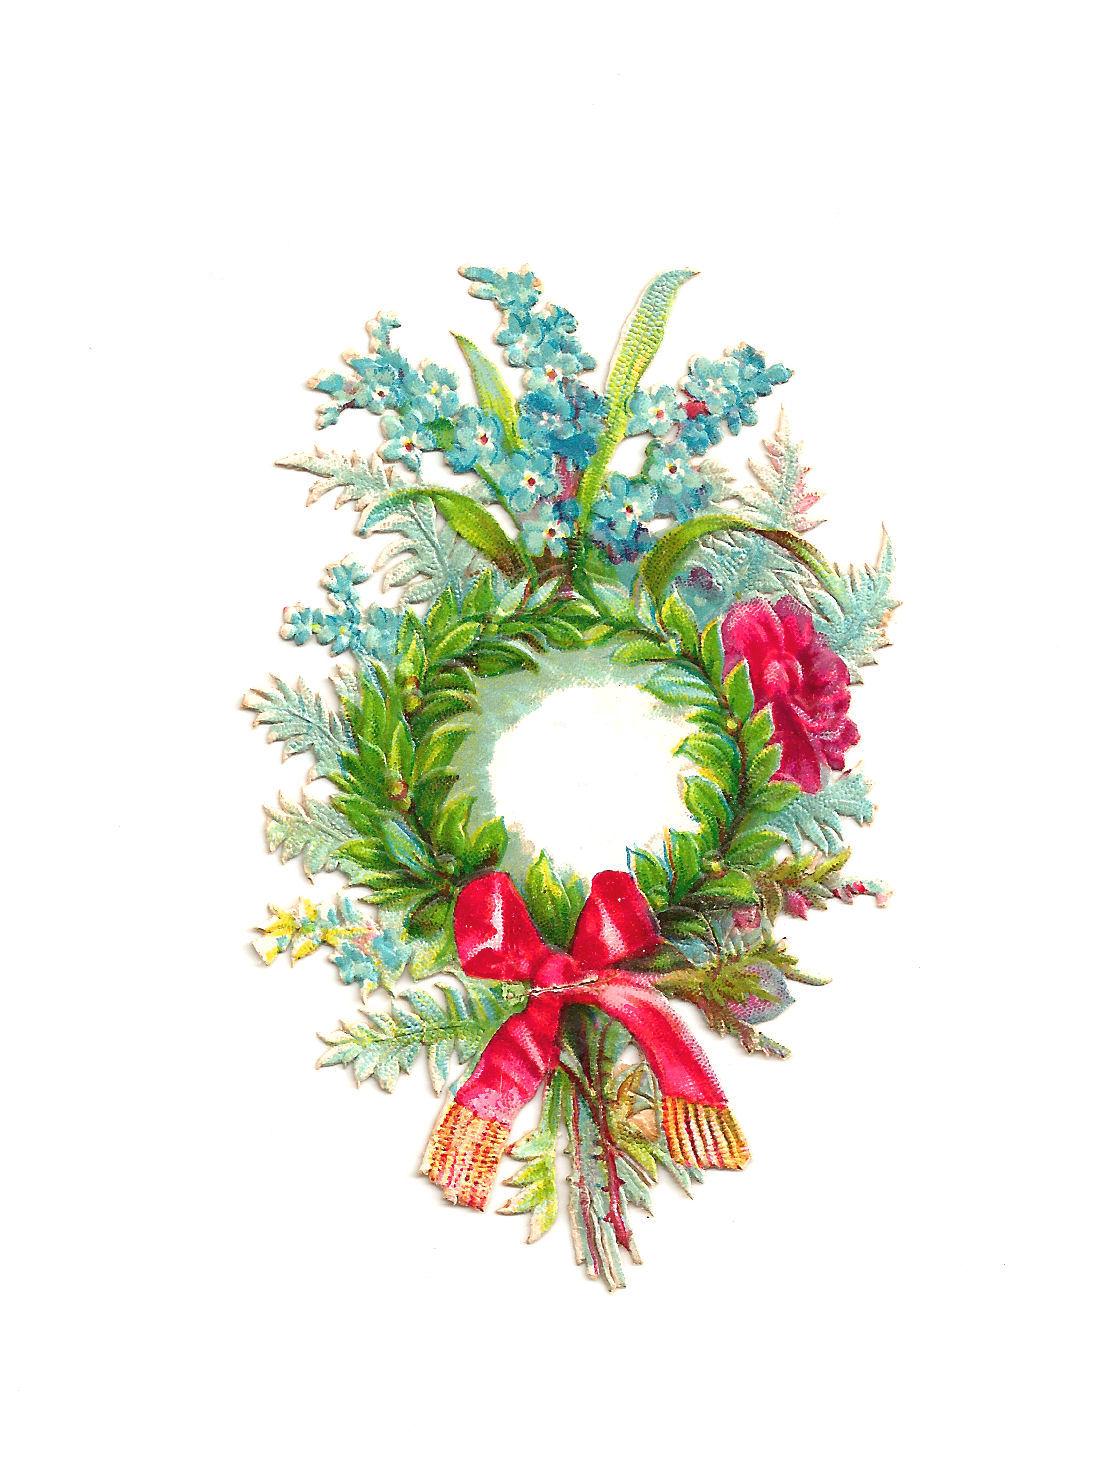 clipart flower wreath - photo #24